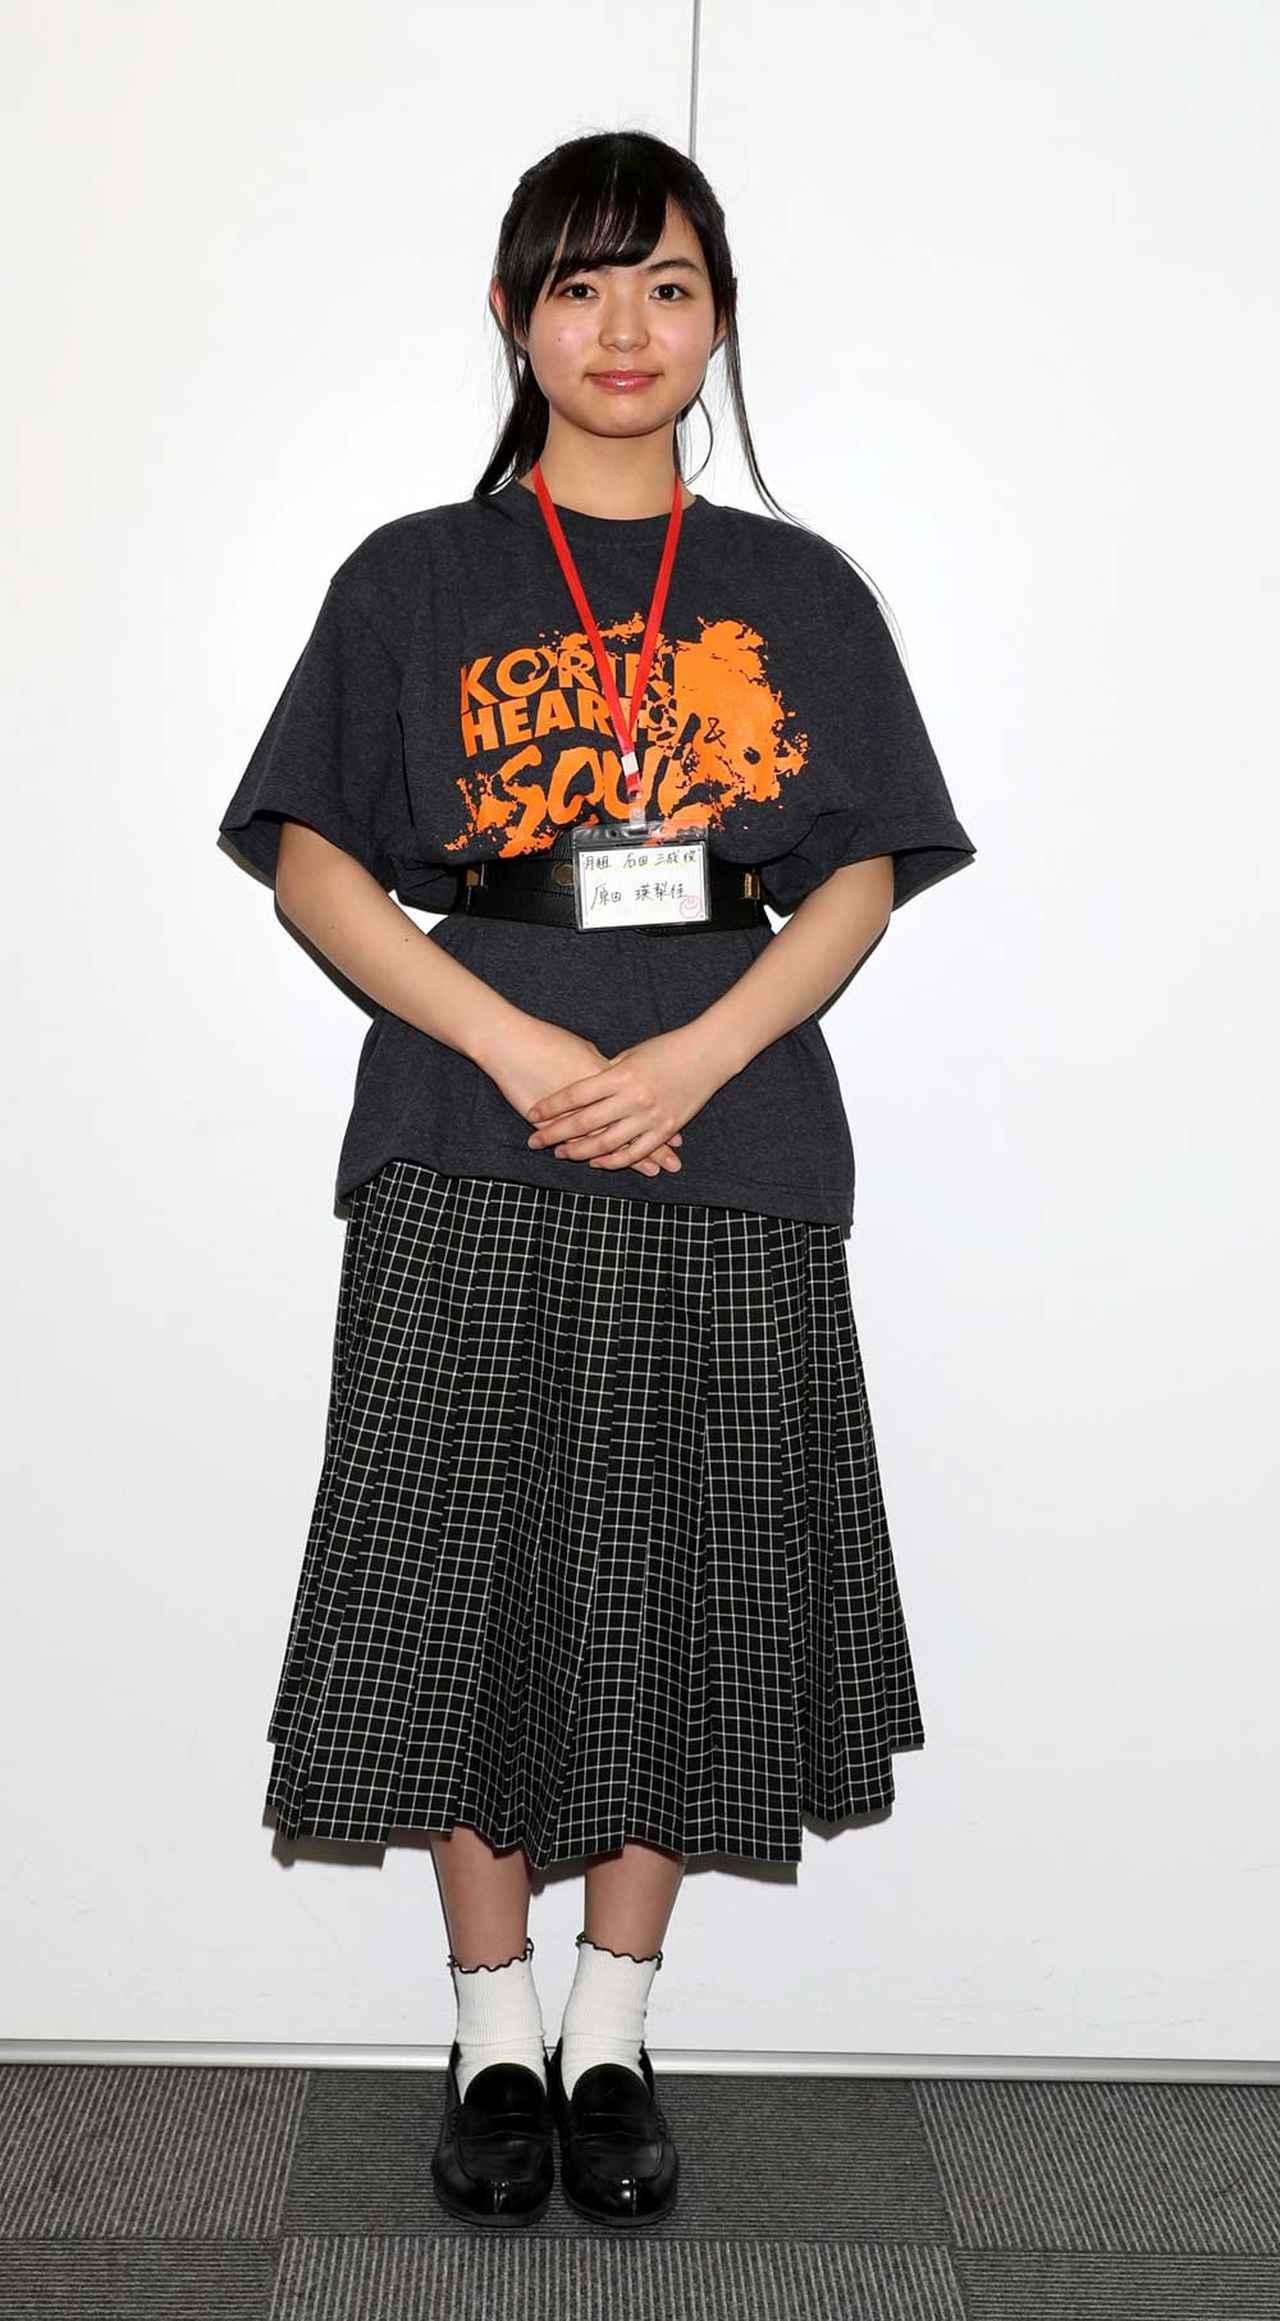 Images : 4番目の画像 - 「中島明子、原田瑛梨佳/舞台に咲く、可憐な二輪、アリスインプロジェクトの最新舞台「降臨Hearts&Soul」で満開に!」のアルバム - Stereo Sound ONLINE